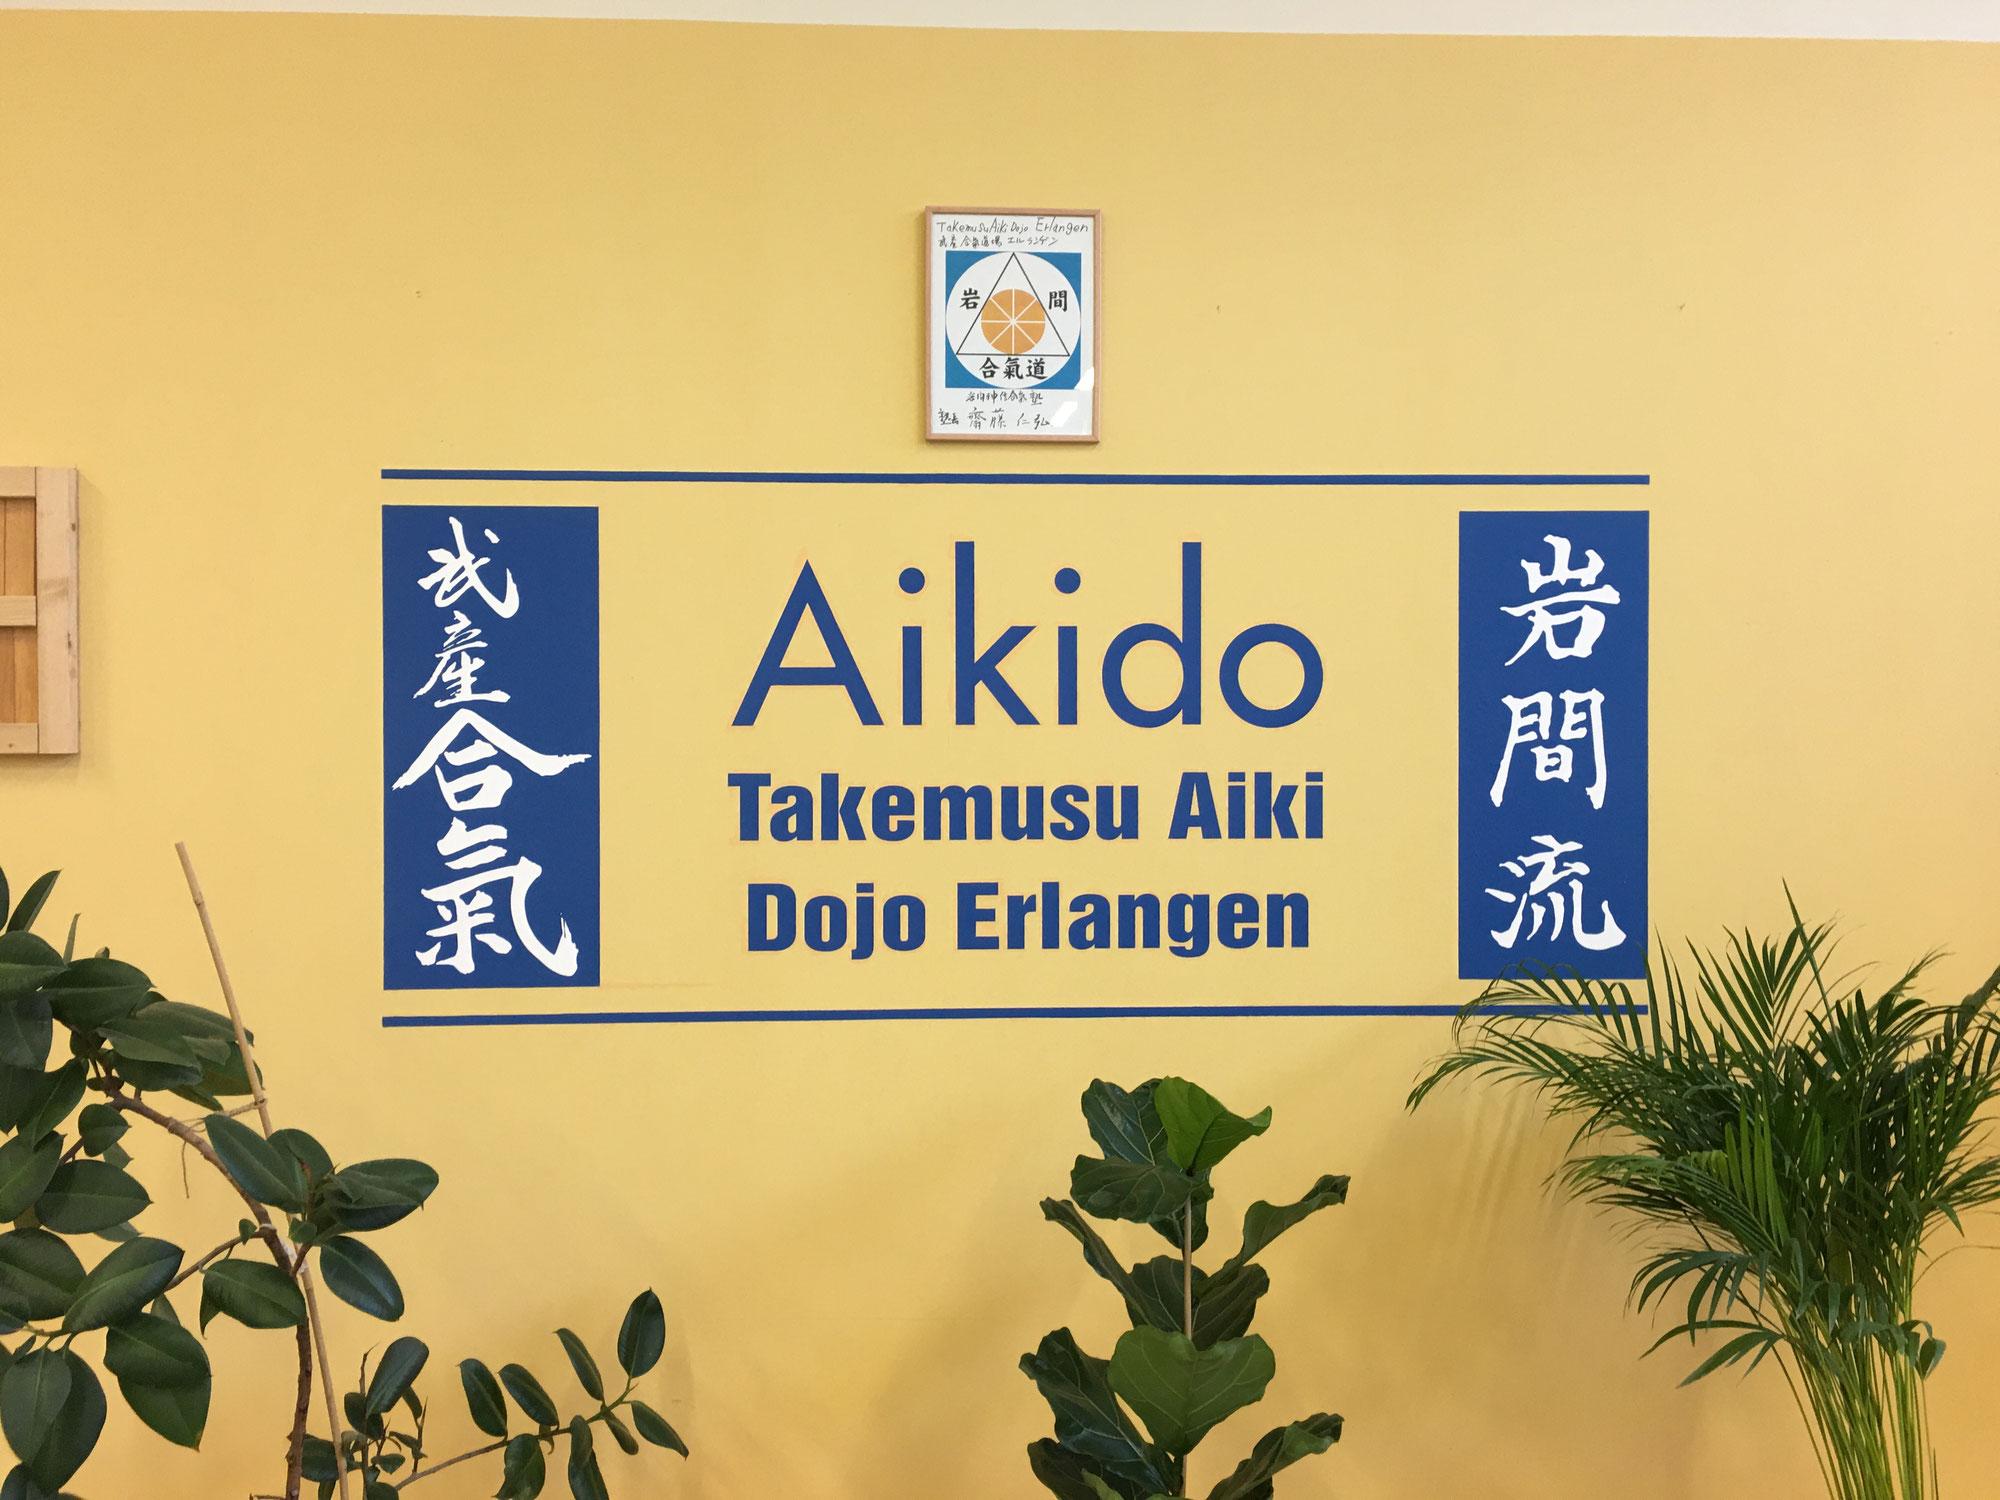 10-12 settembre: koshukai a Erlangen di Boglio Shihan